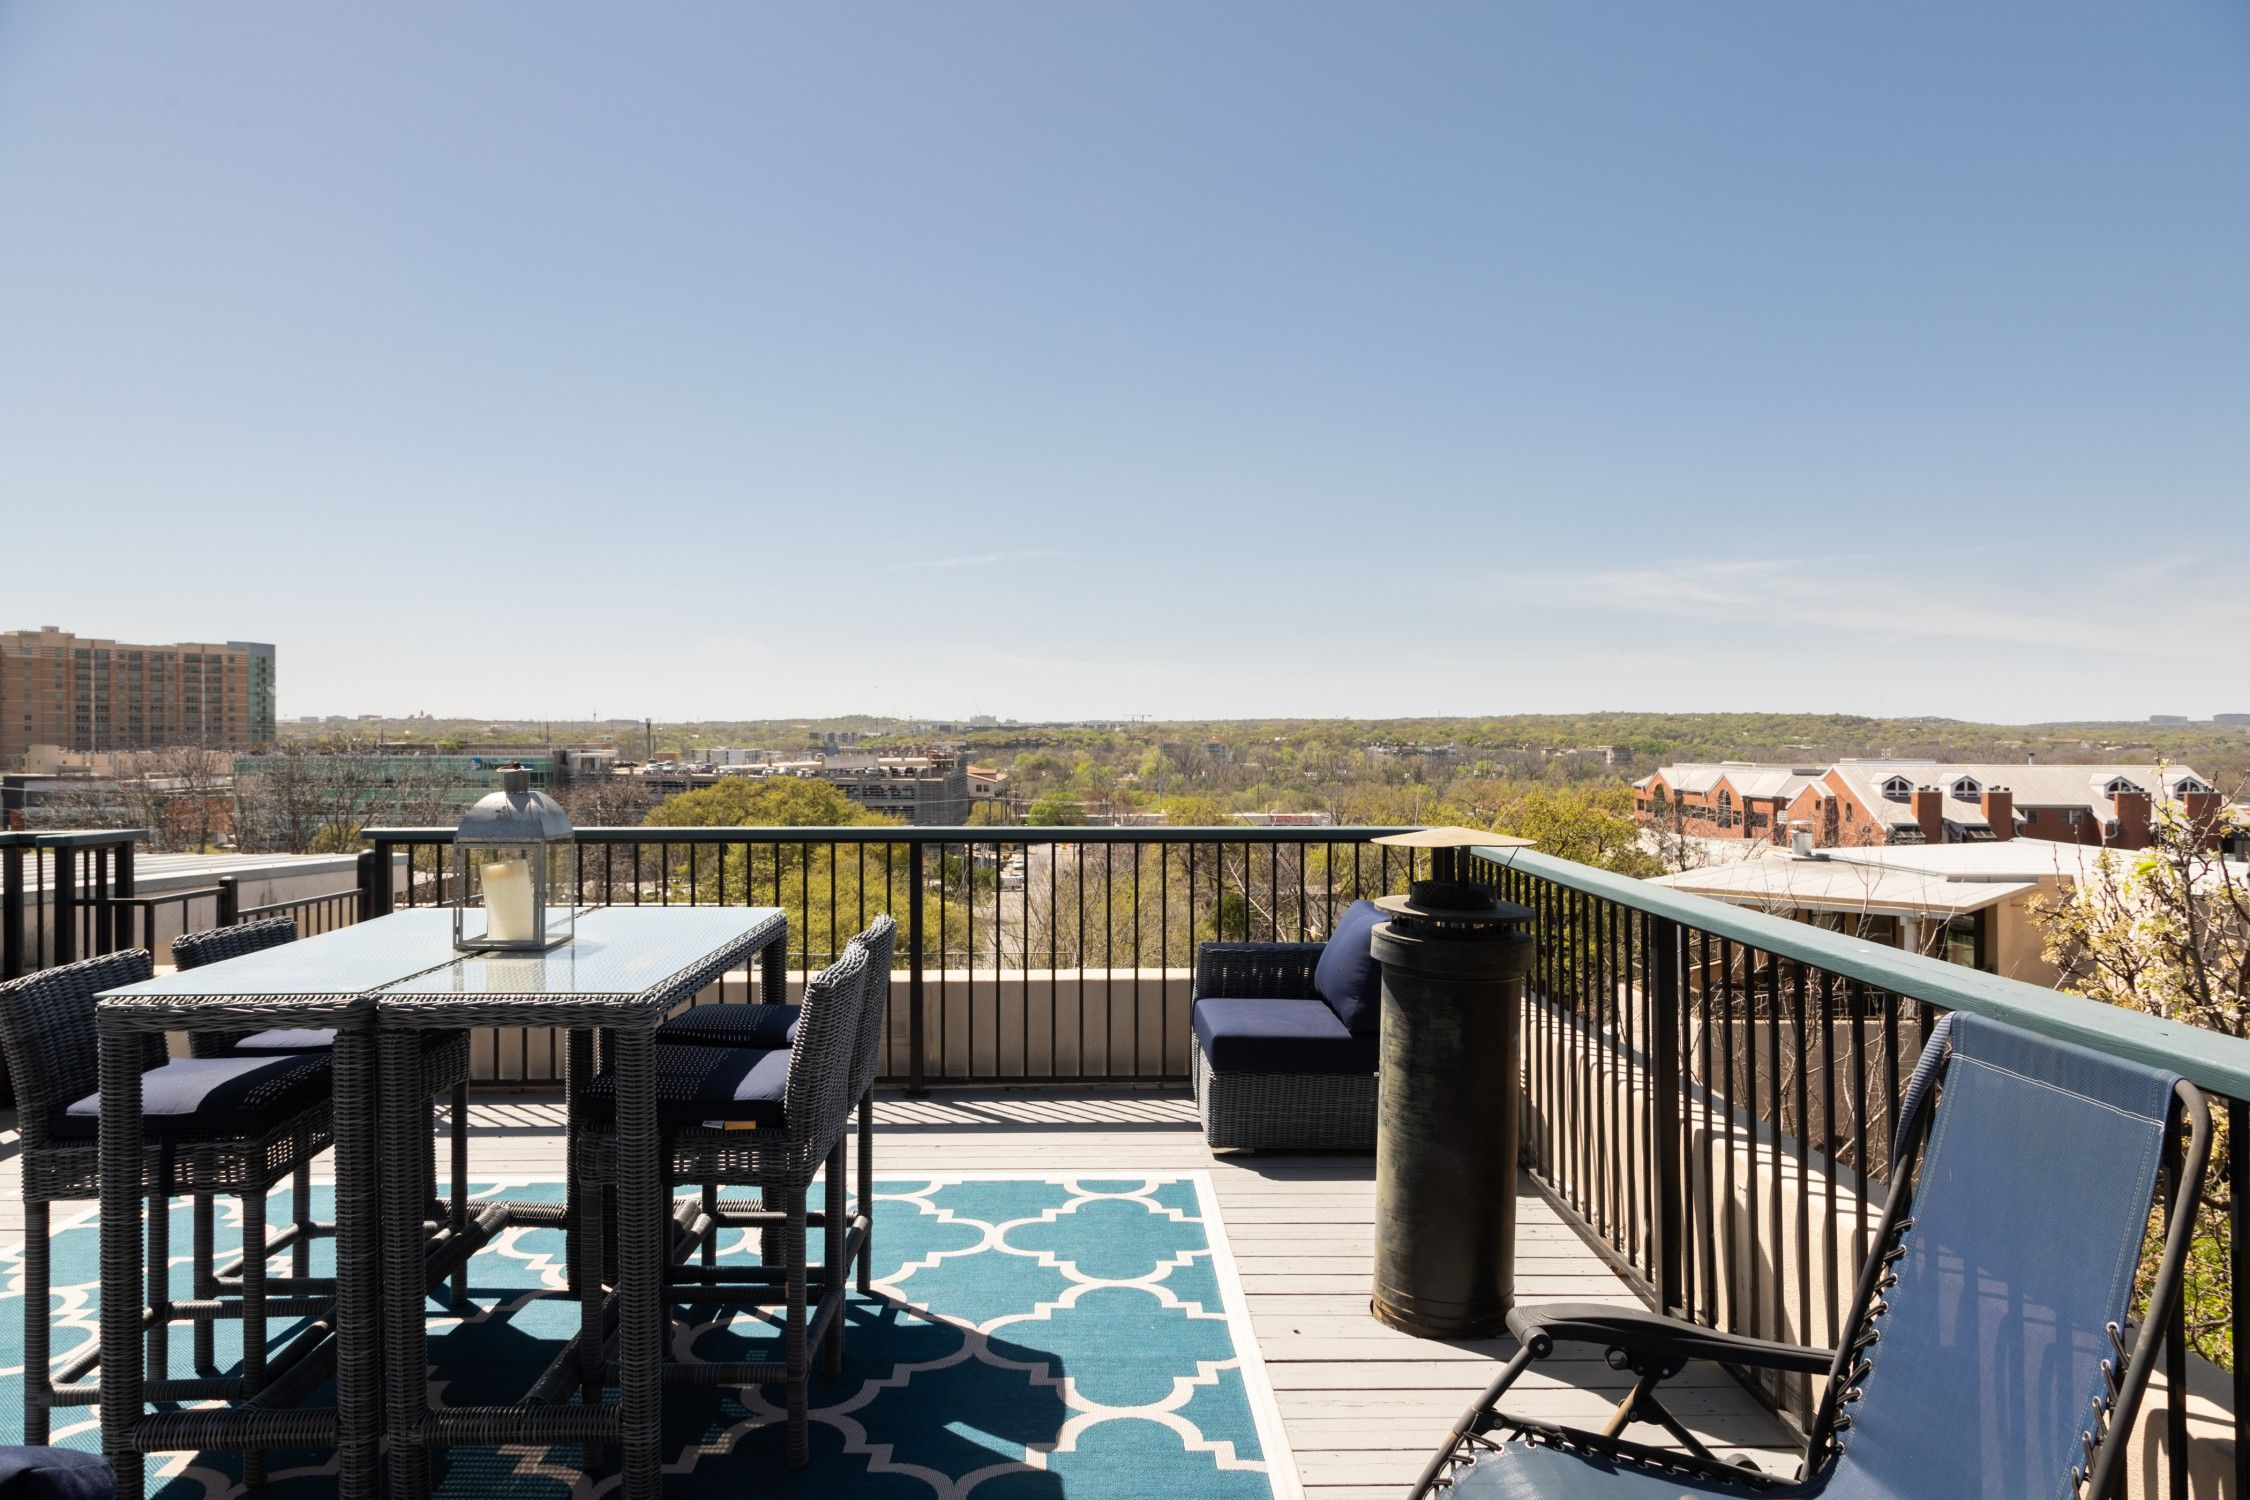 Entire Home Apt In Austin United States 2 Guests 1 Bedroom 1 Bed 1 5 Baths Sxsw Airbnb Interiordesign Travel Accommodati Rooftop Patio Condominium Condo